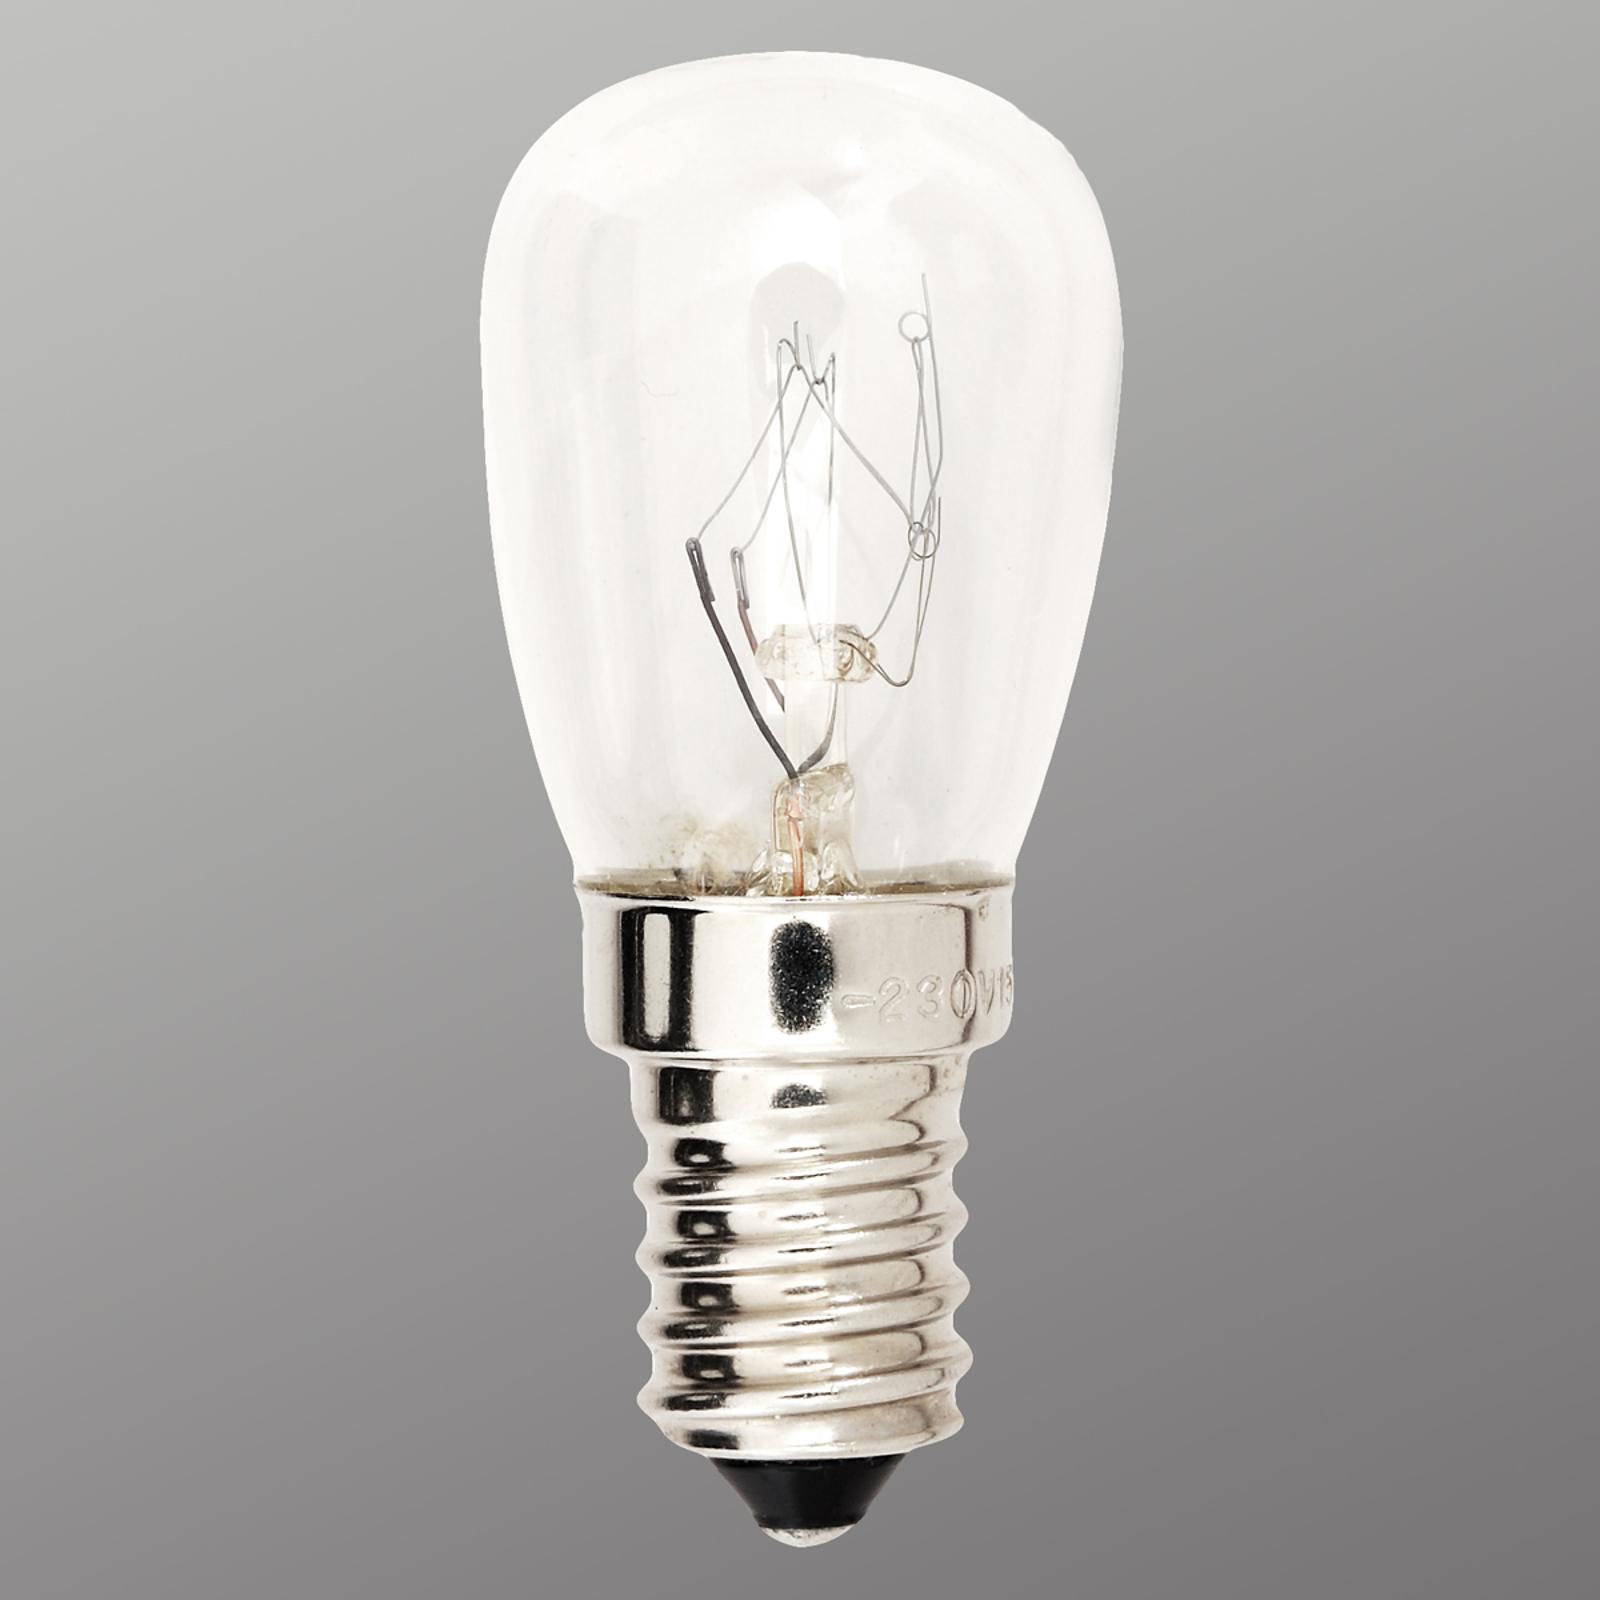 Lampka zast. E14, 15 W 240 V, 1 szt. w opakowaniu